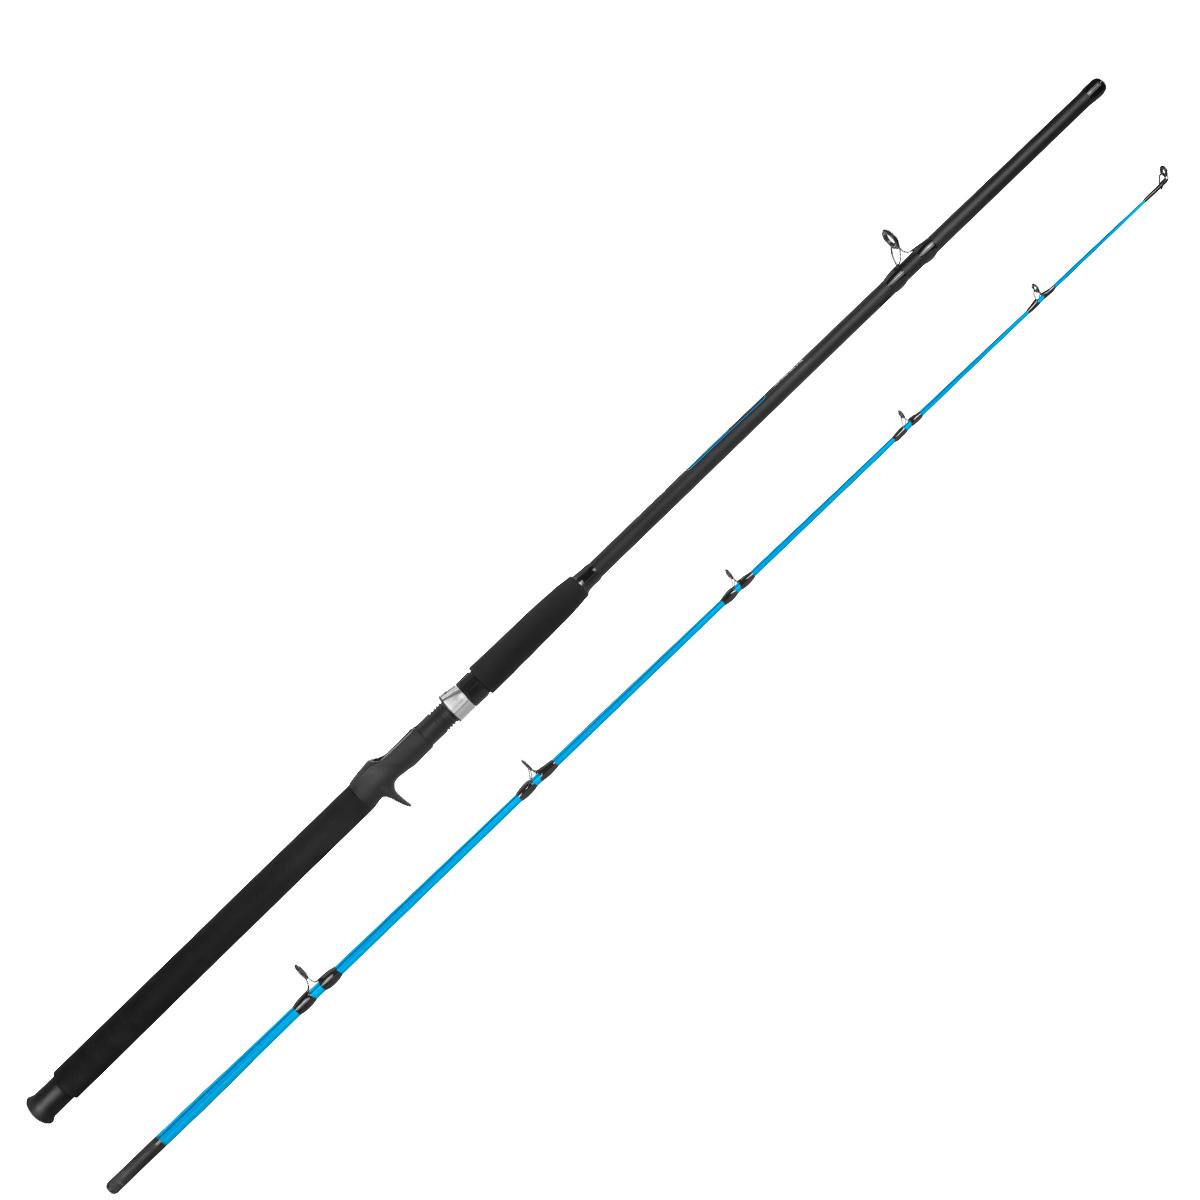 Vara Saint Hardline P/ Carretilha 2,70 m 40 lbs (2 Partes)  - Pró Pesca Shop